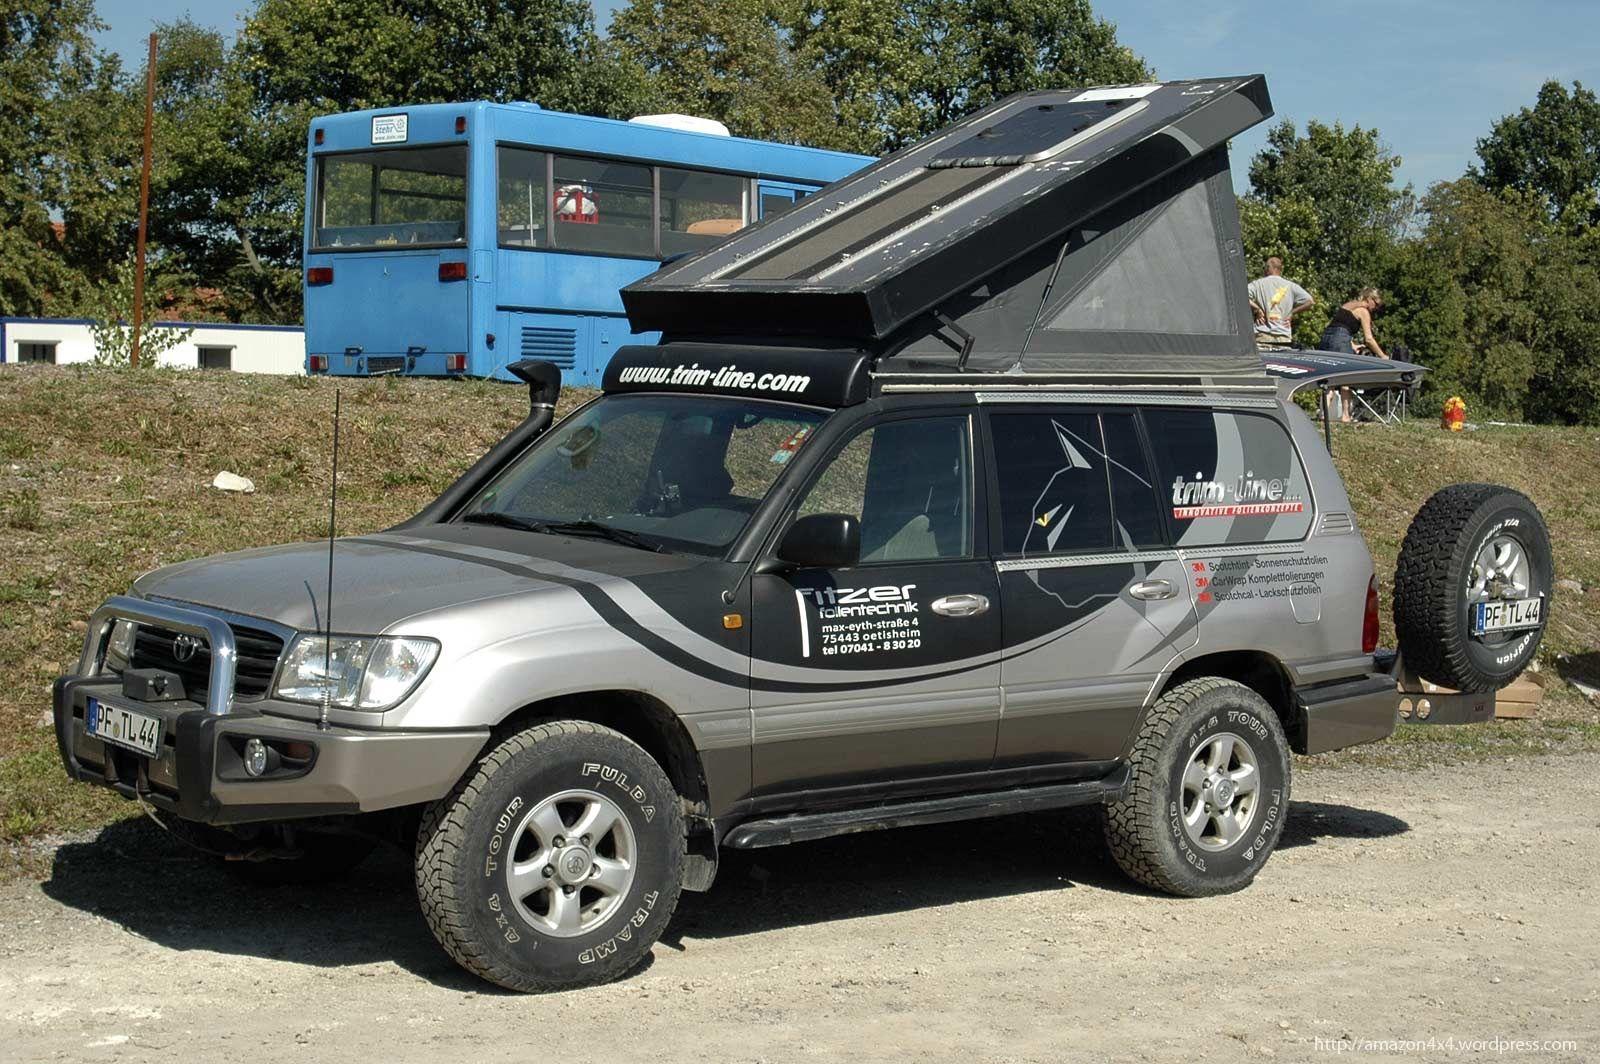 Toyota Land Cruiser 100 Converted For Camper Top With Headroom Toyota Land Cruiser 100 Land Cruiser Toyota Land Cruiser